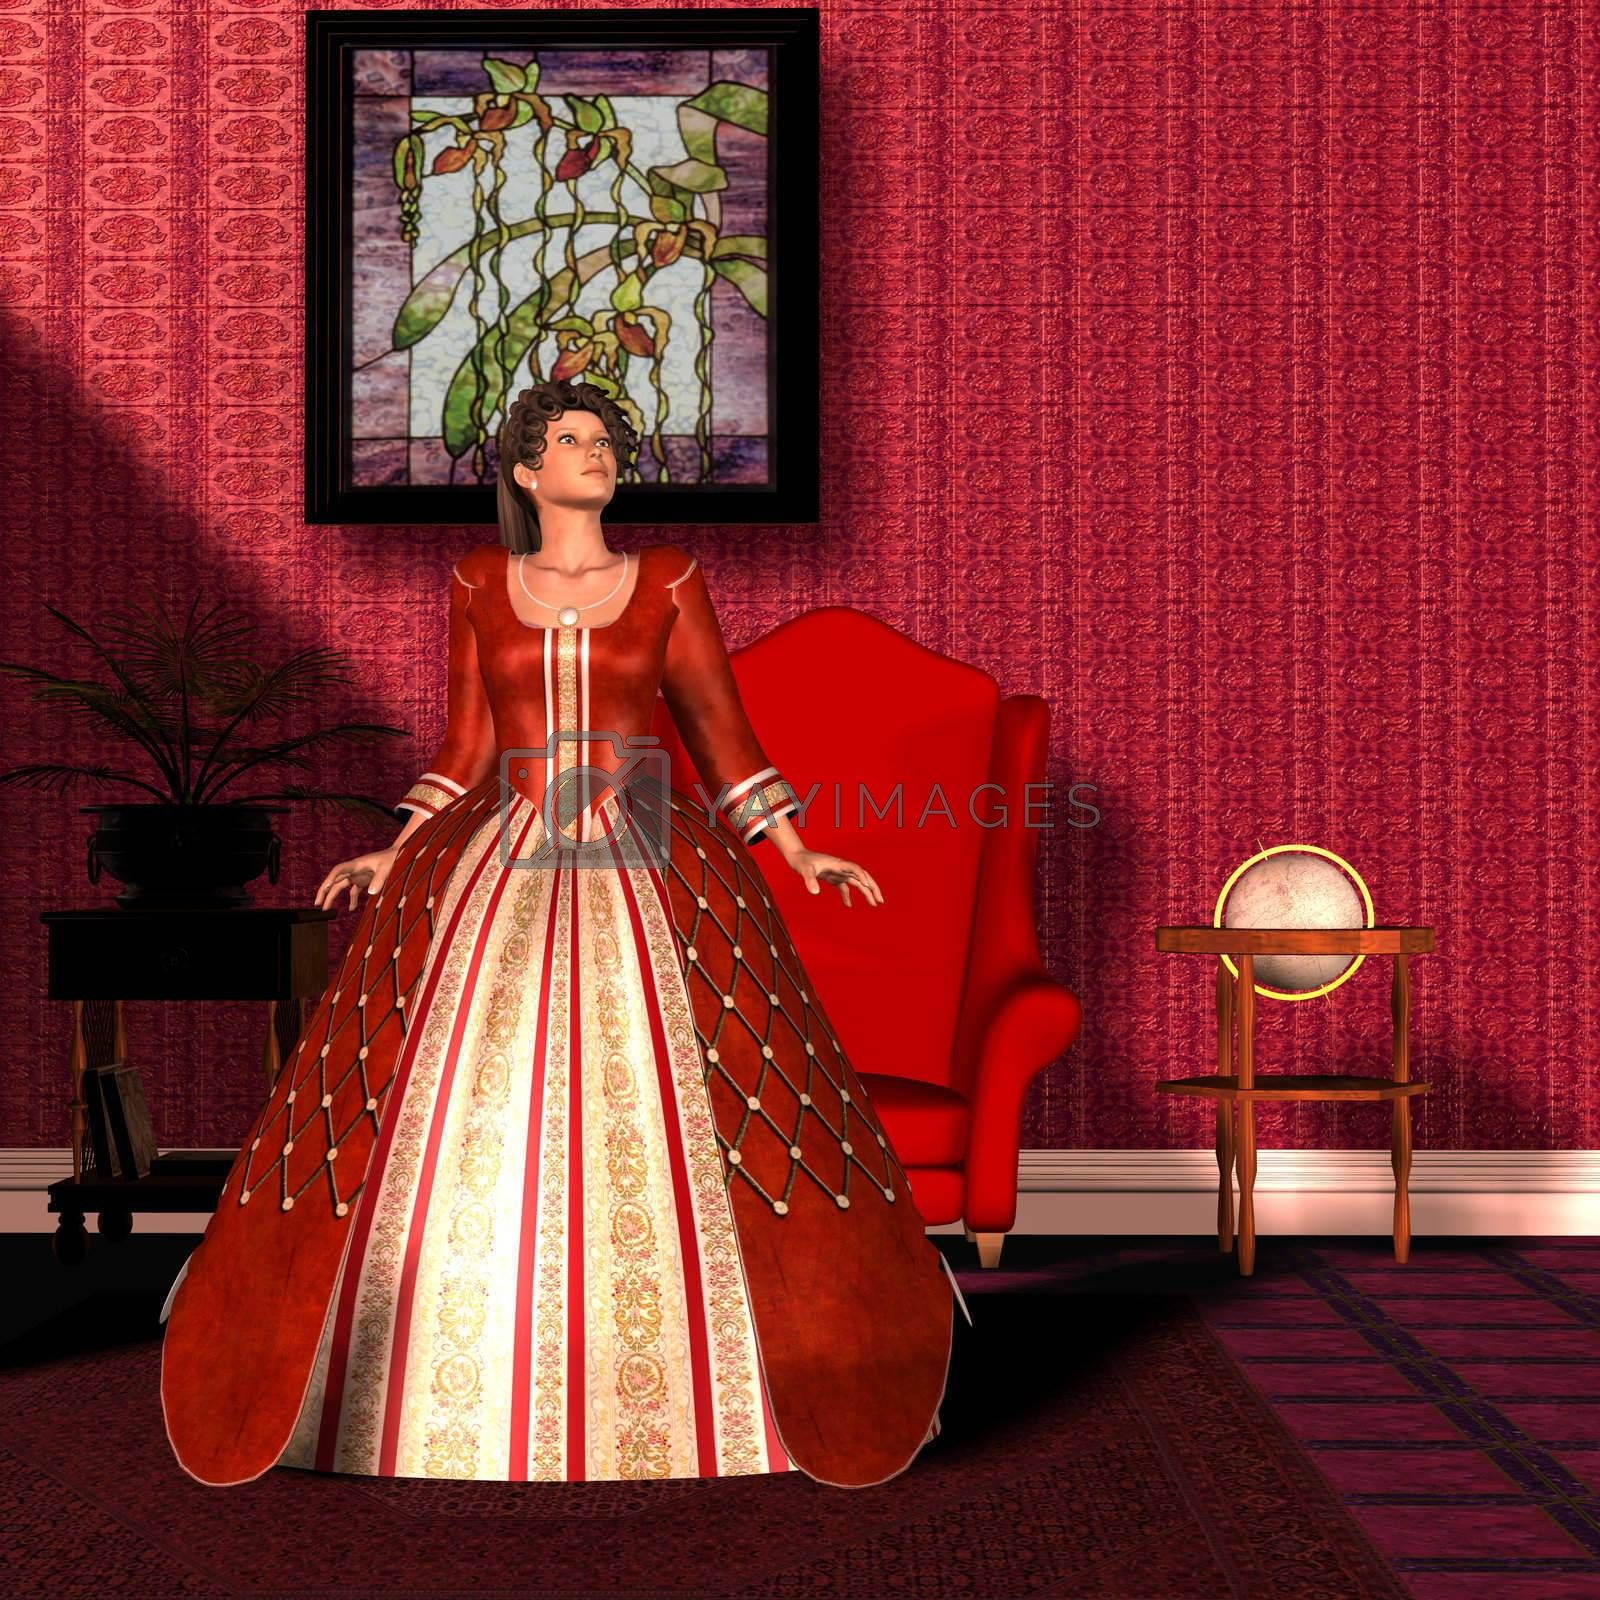 Royalty free image of NATIONAL VELVET by Catmando